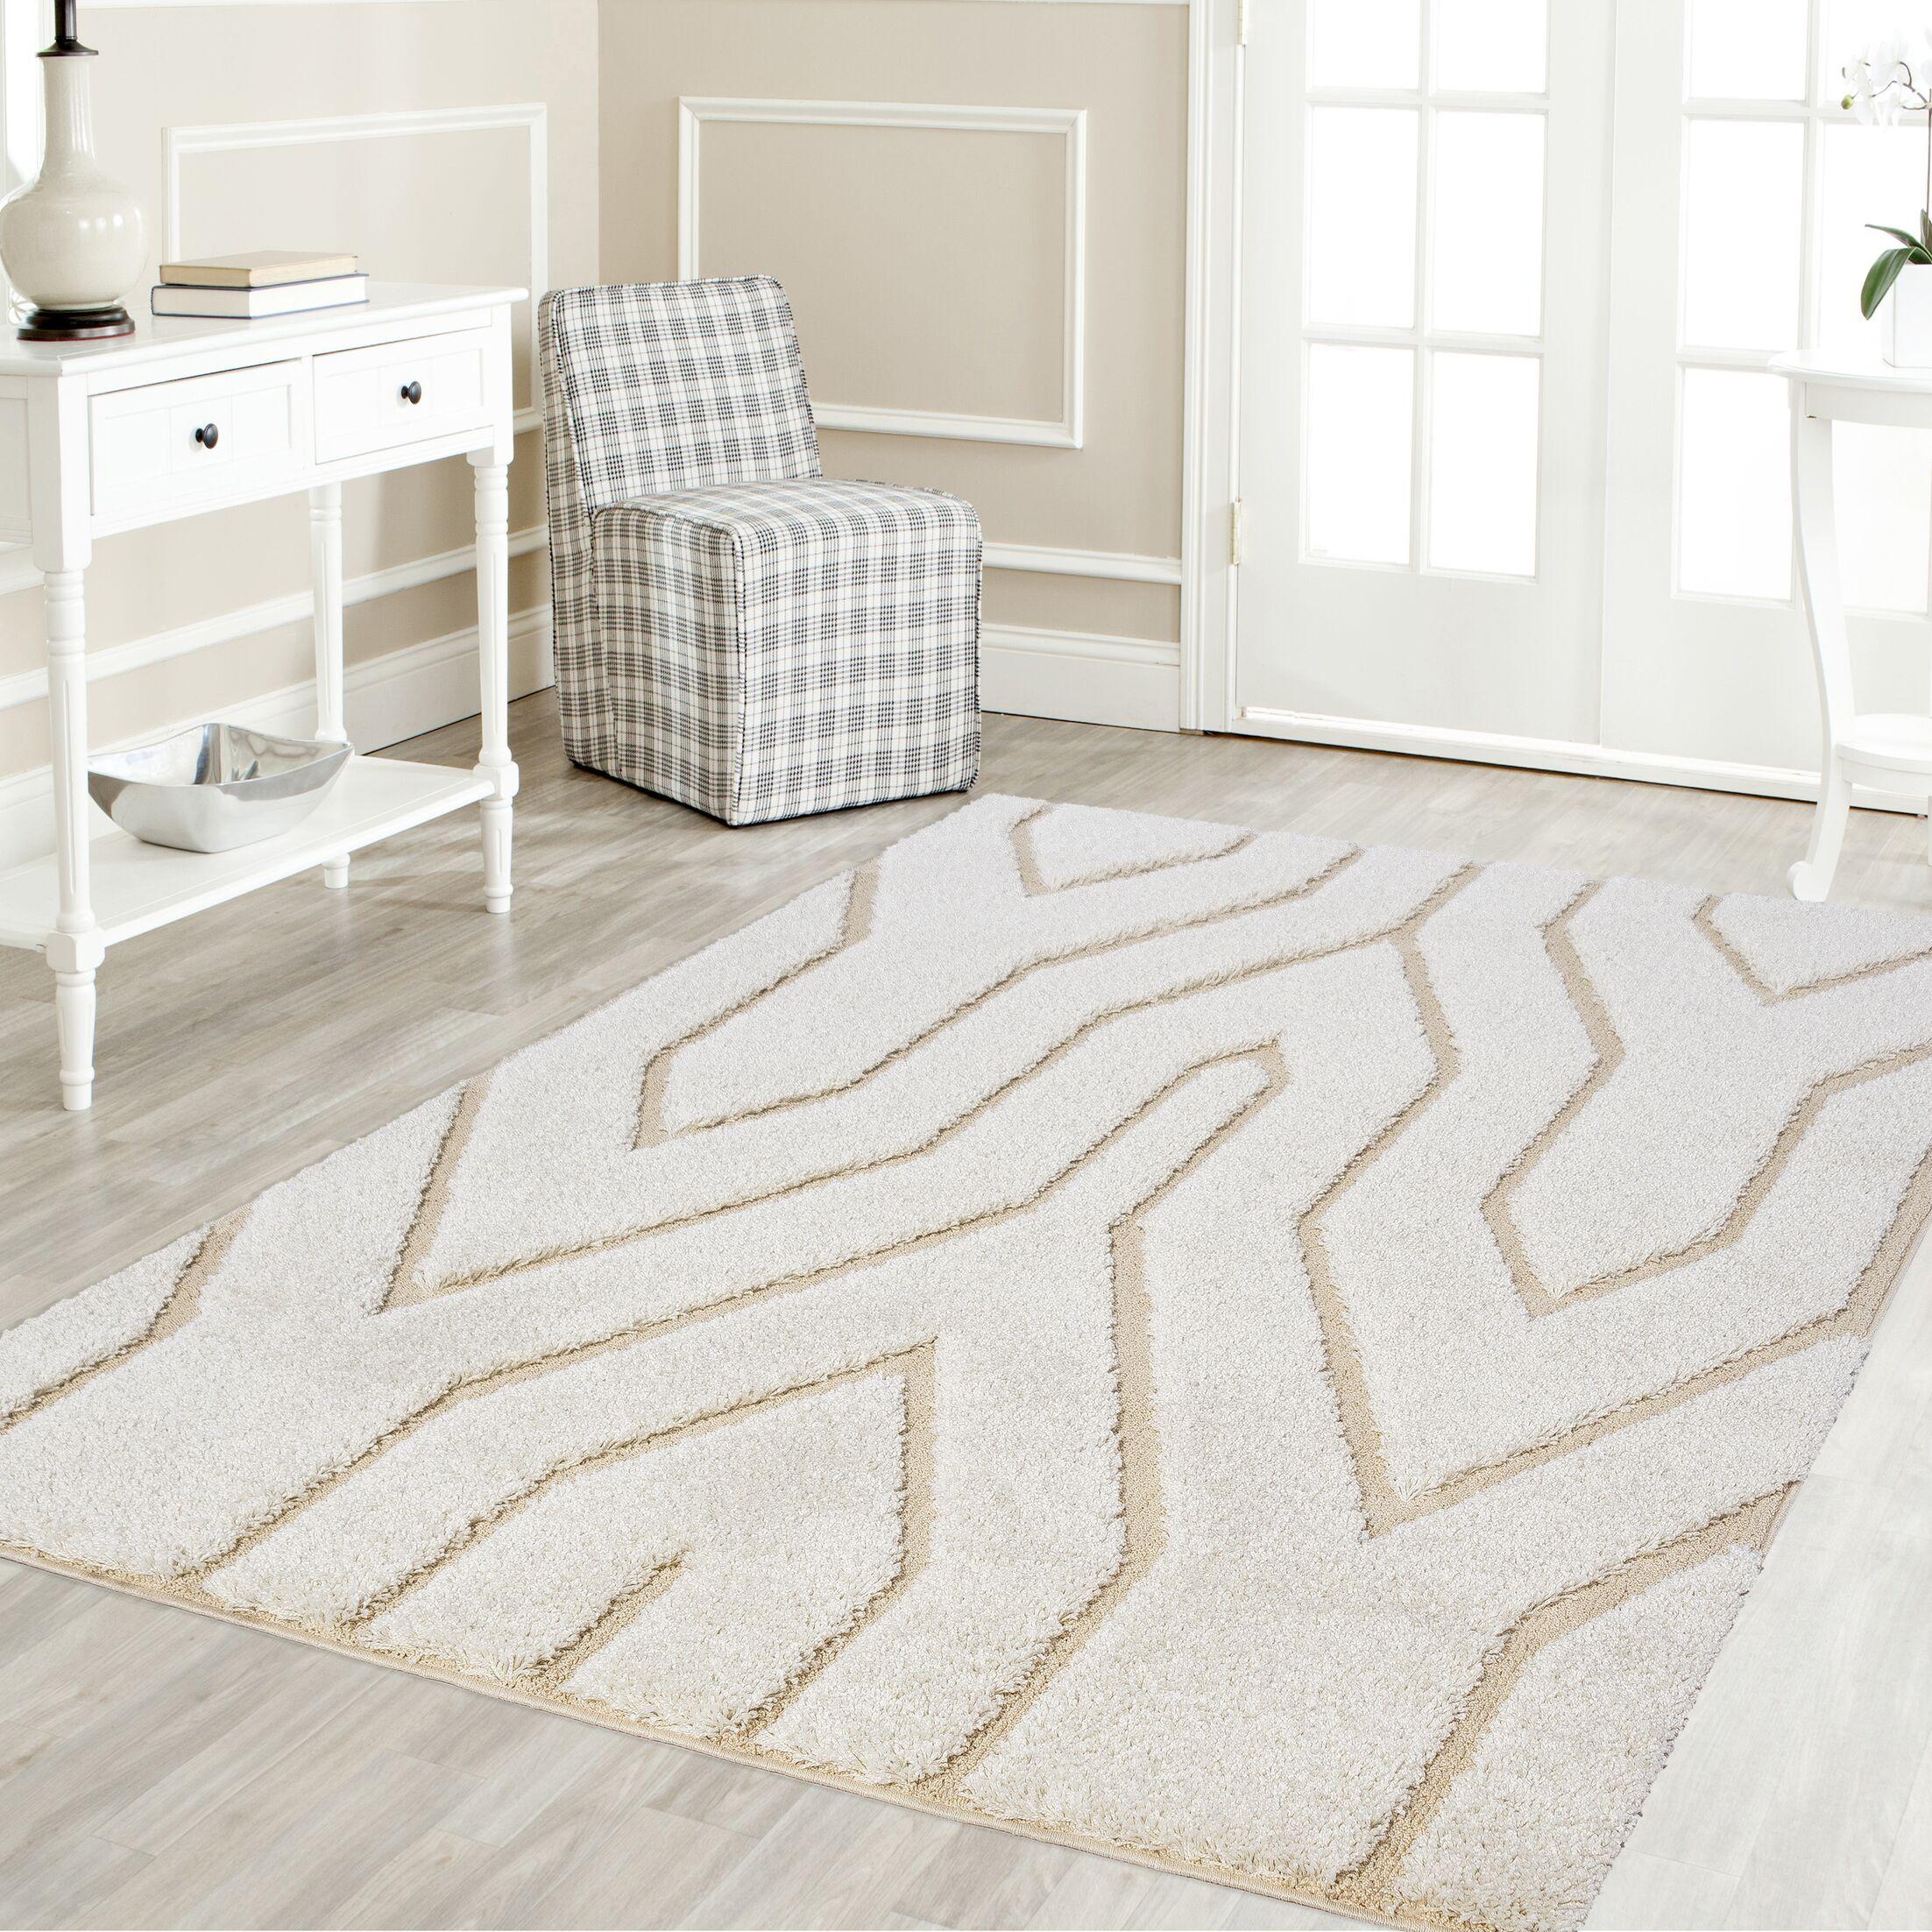 Artz White/Beige Lines Area Rug Size: 5' x 8'